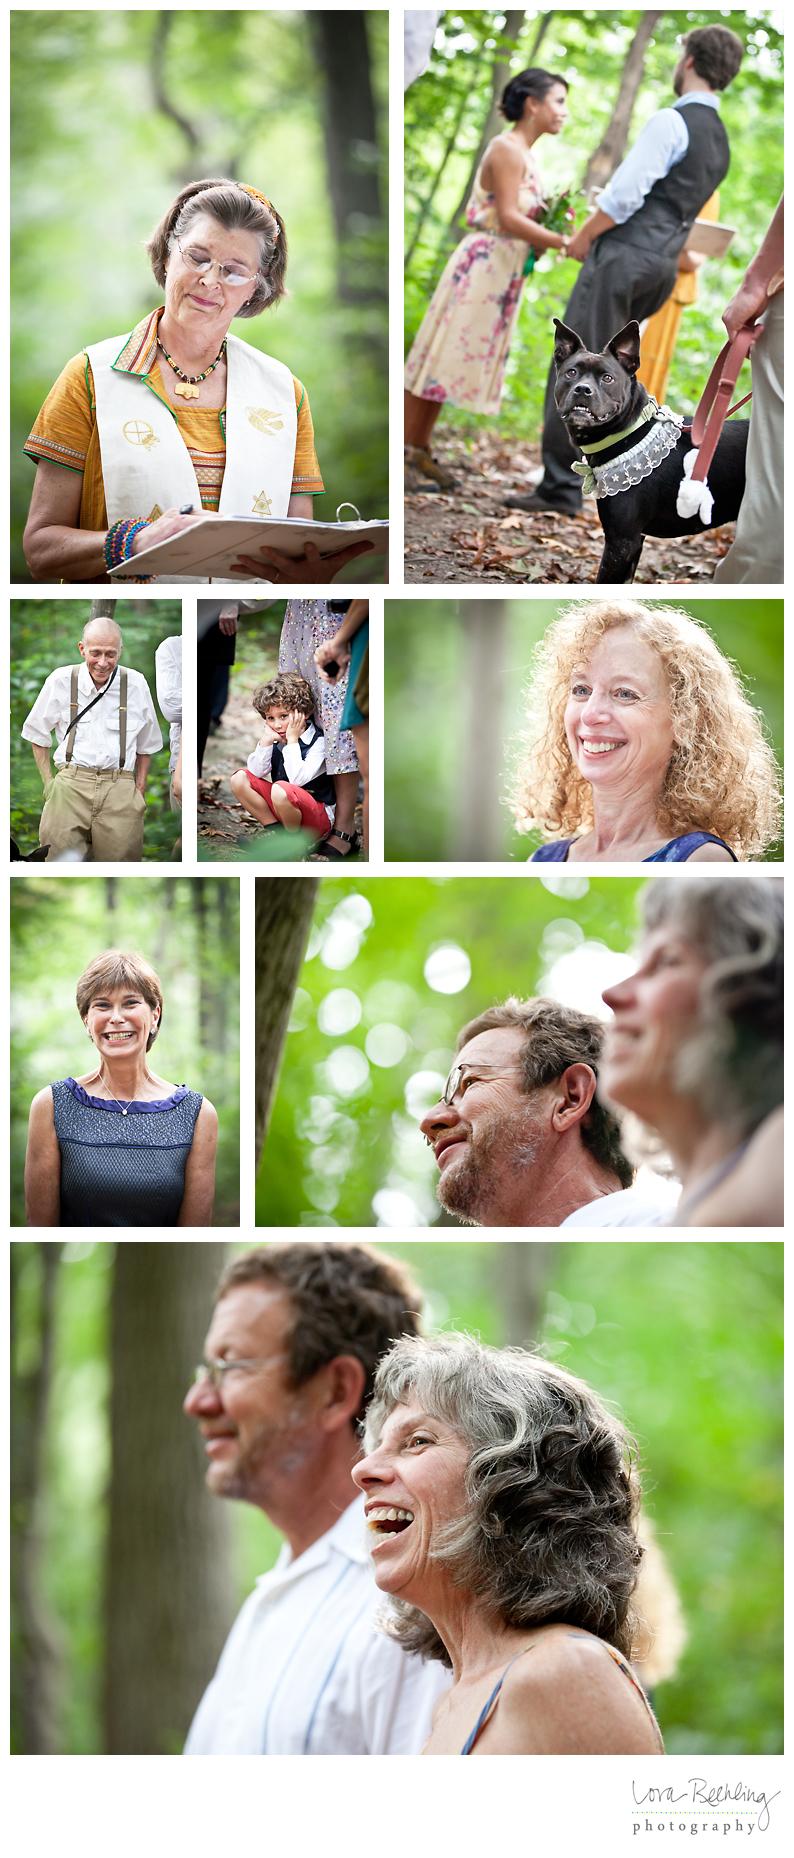 Blog-Collage-1378152721348